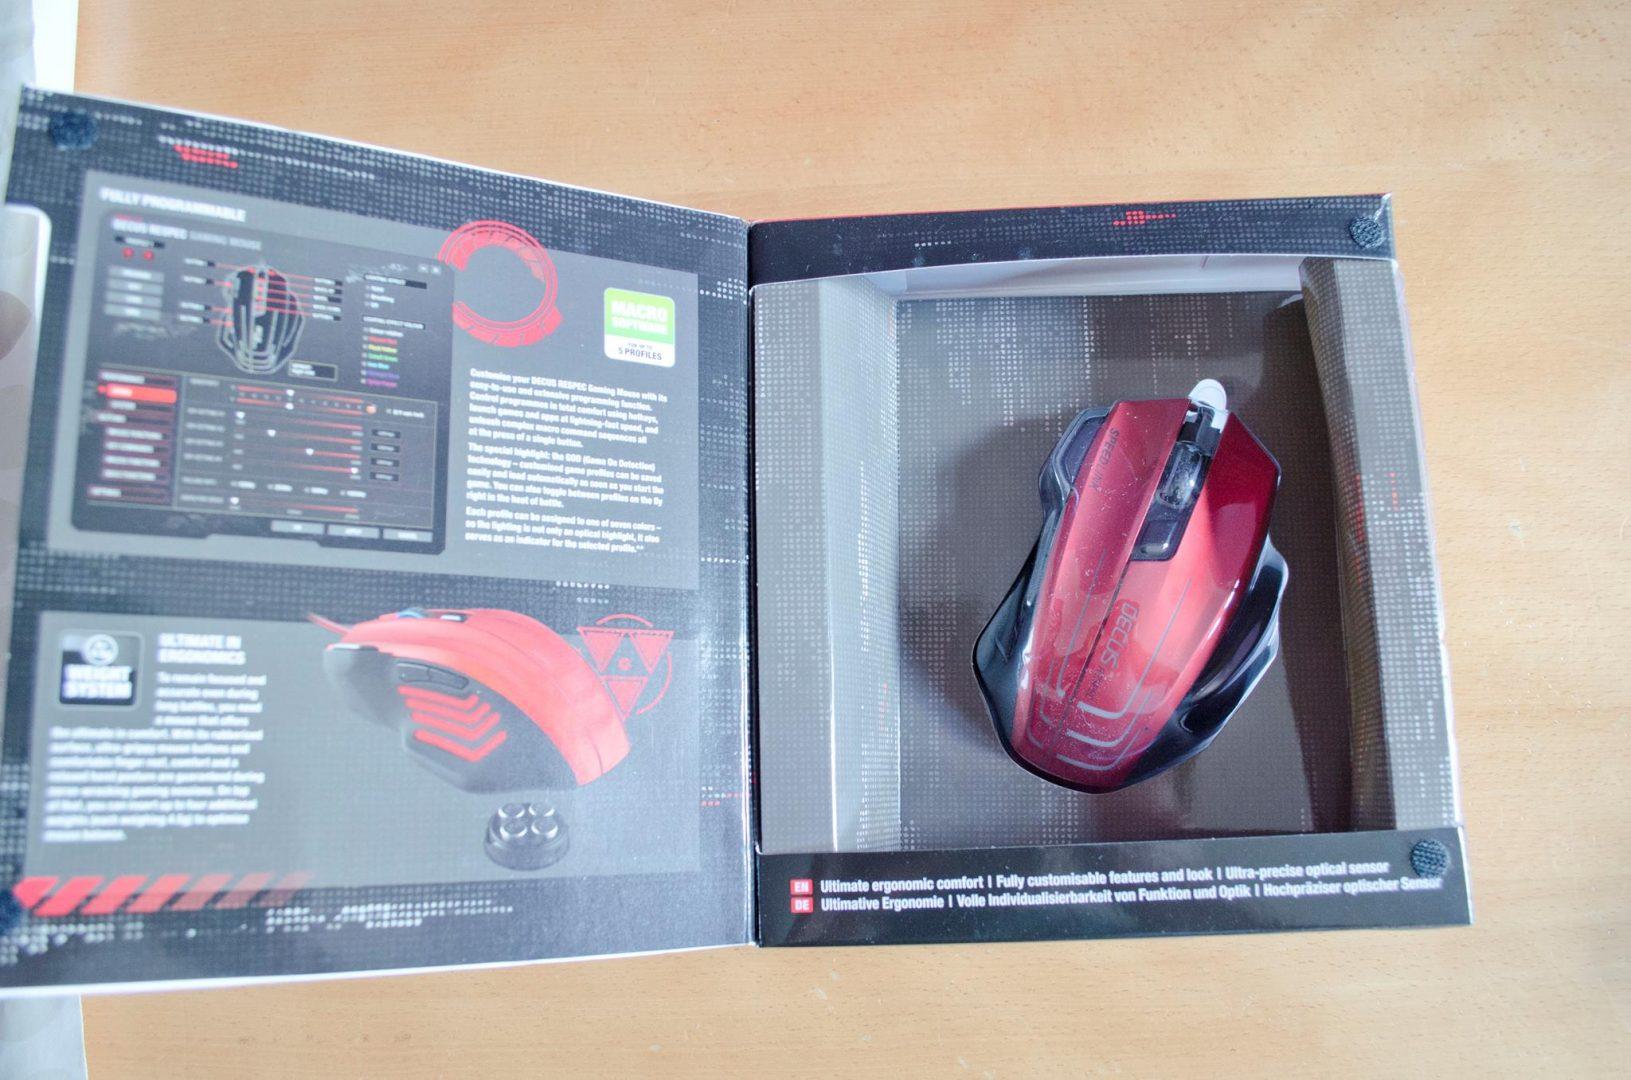 speedlink decus respec gaming mouse review_11